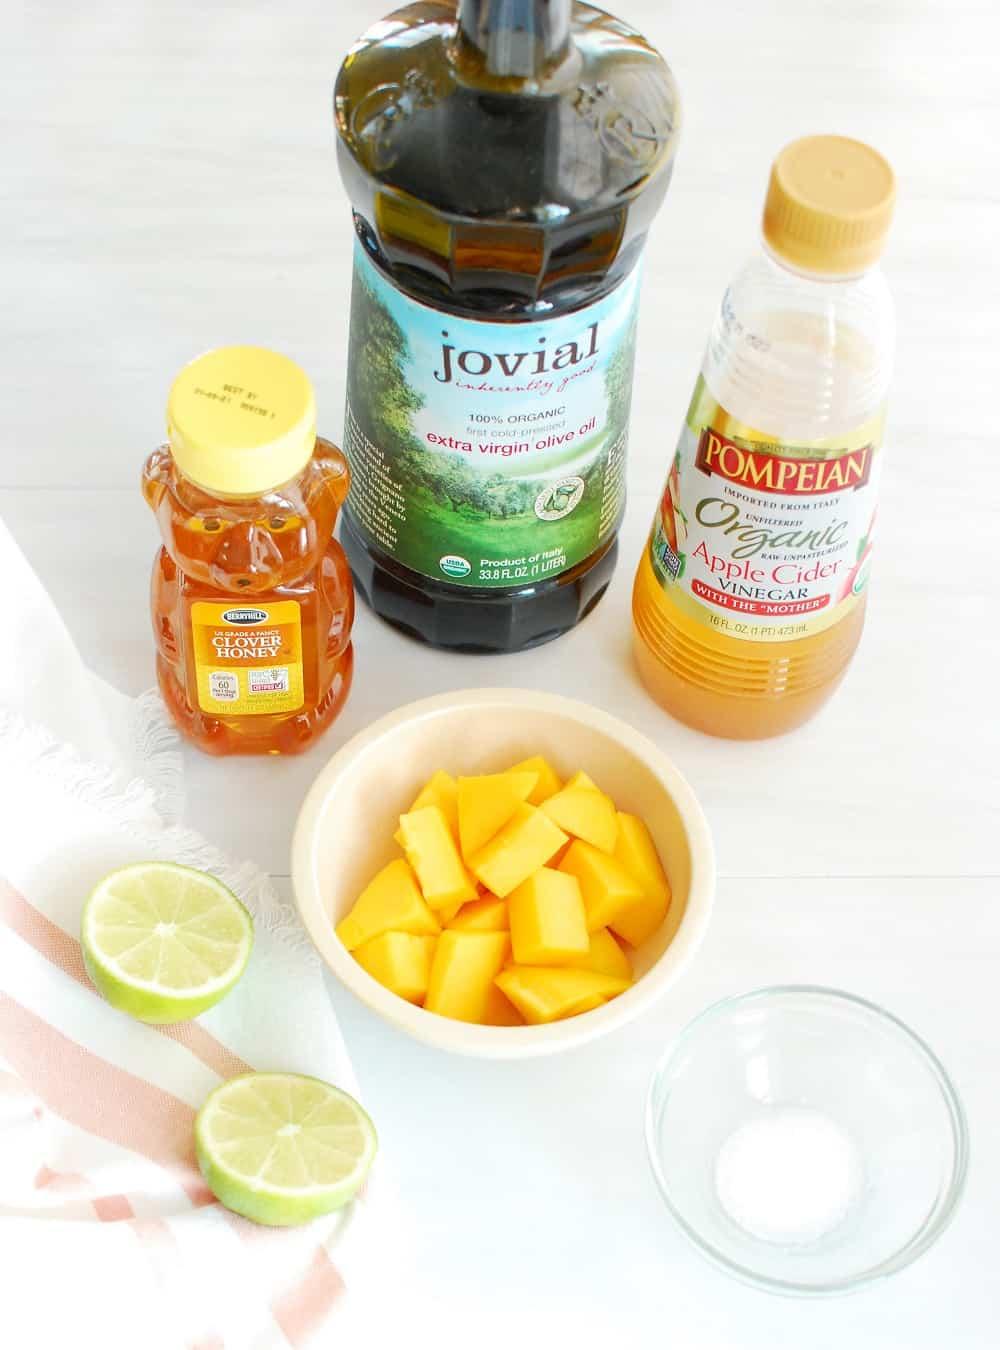 Ingredients to make a homemade salad dressing including mango, lime, honey, vinegar, oil, and salt